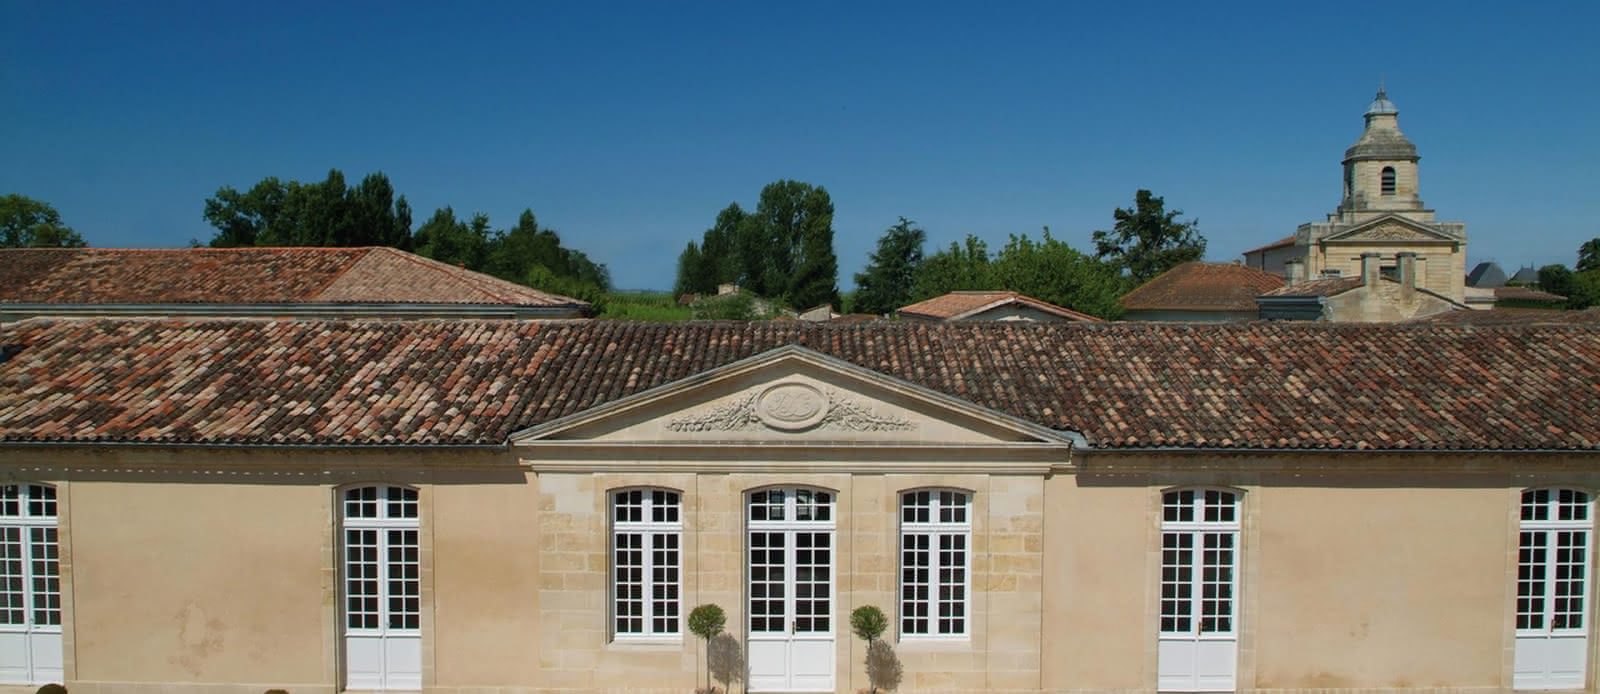 Cantenac - Château Desmirail2